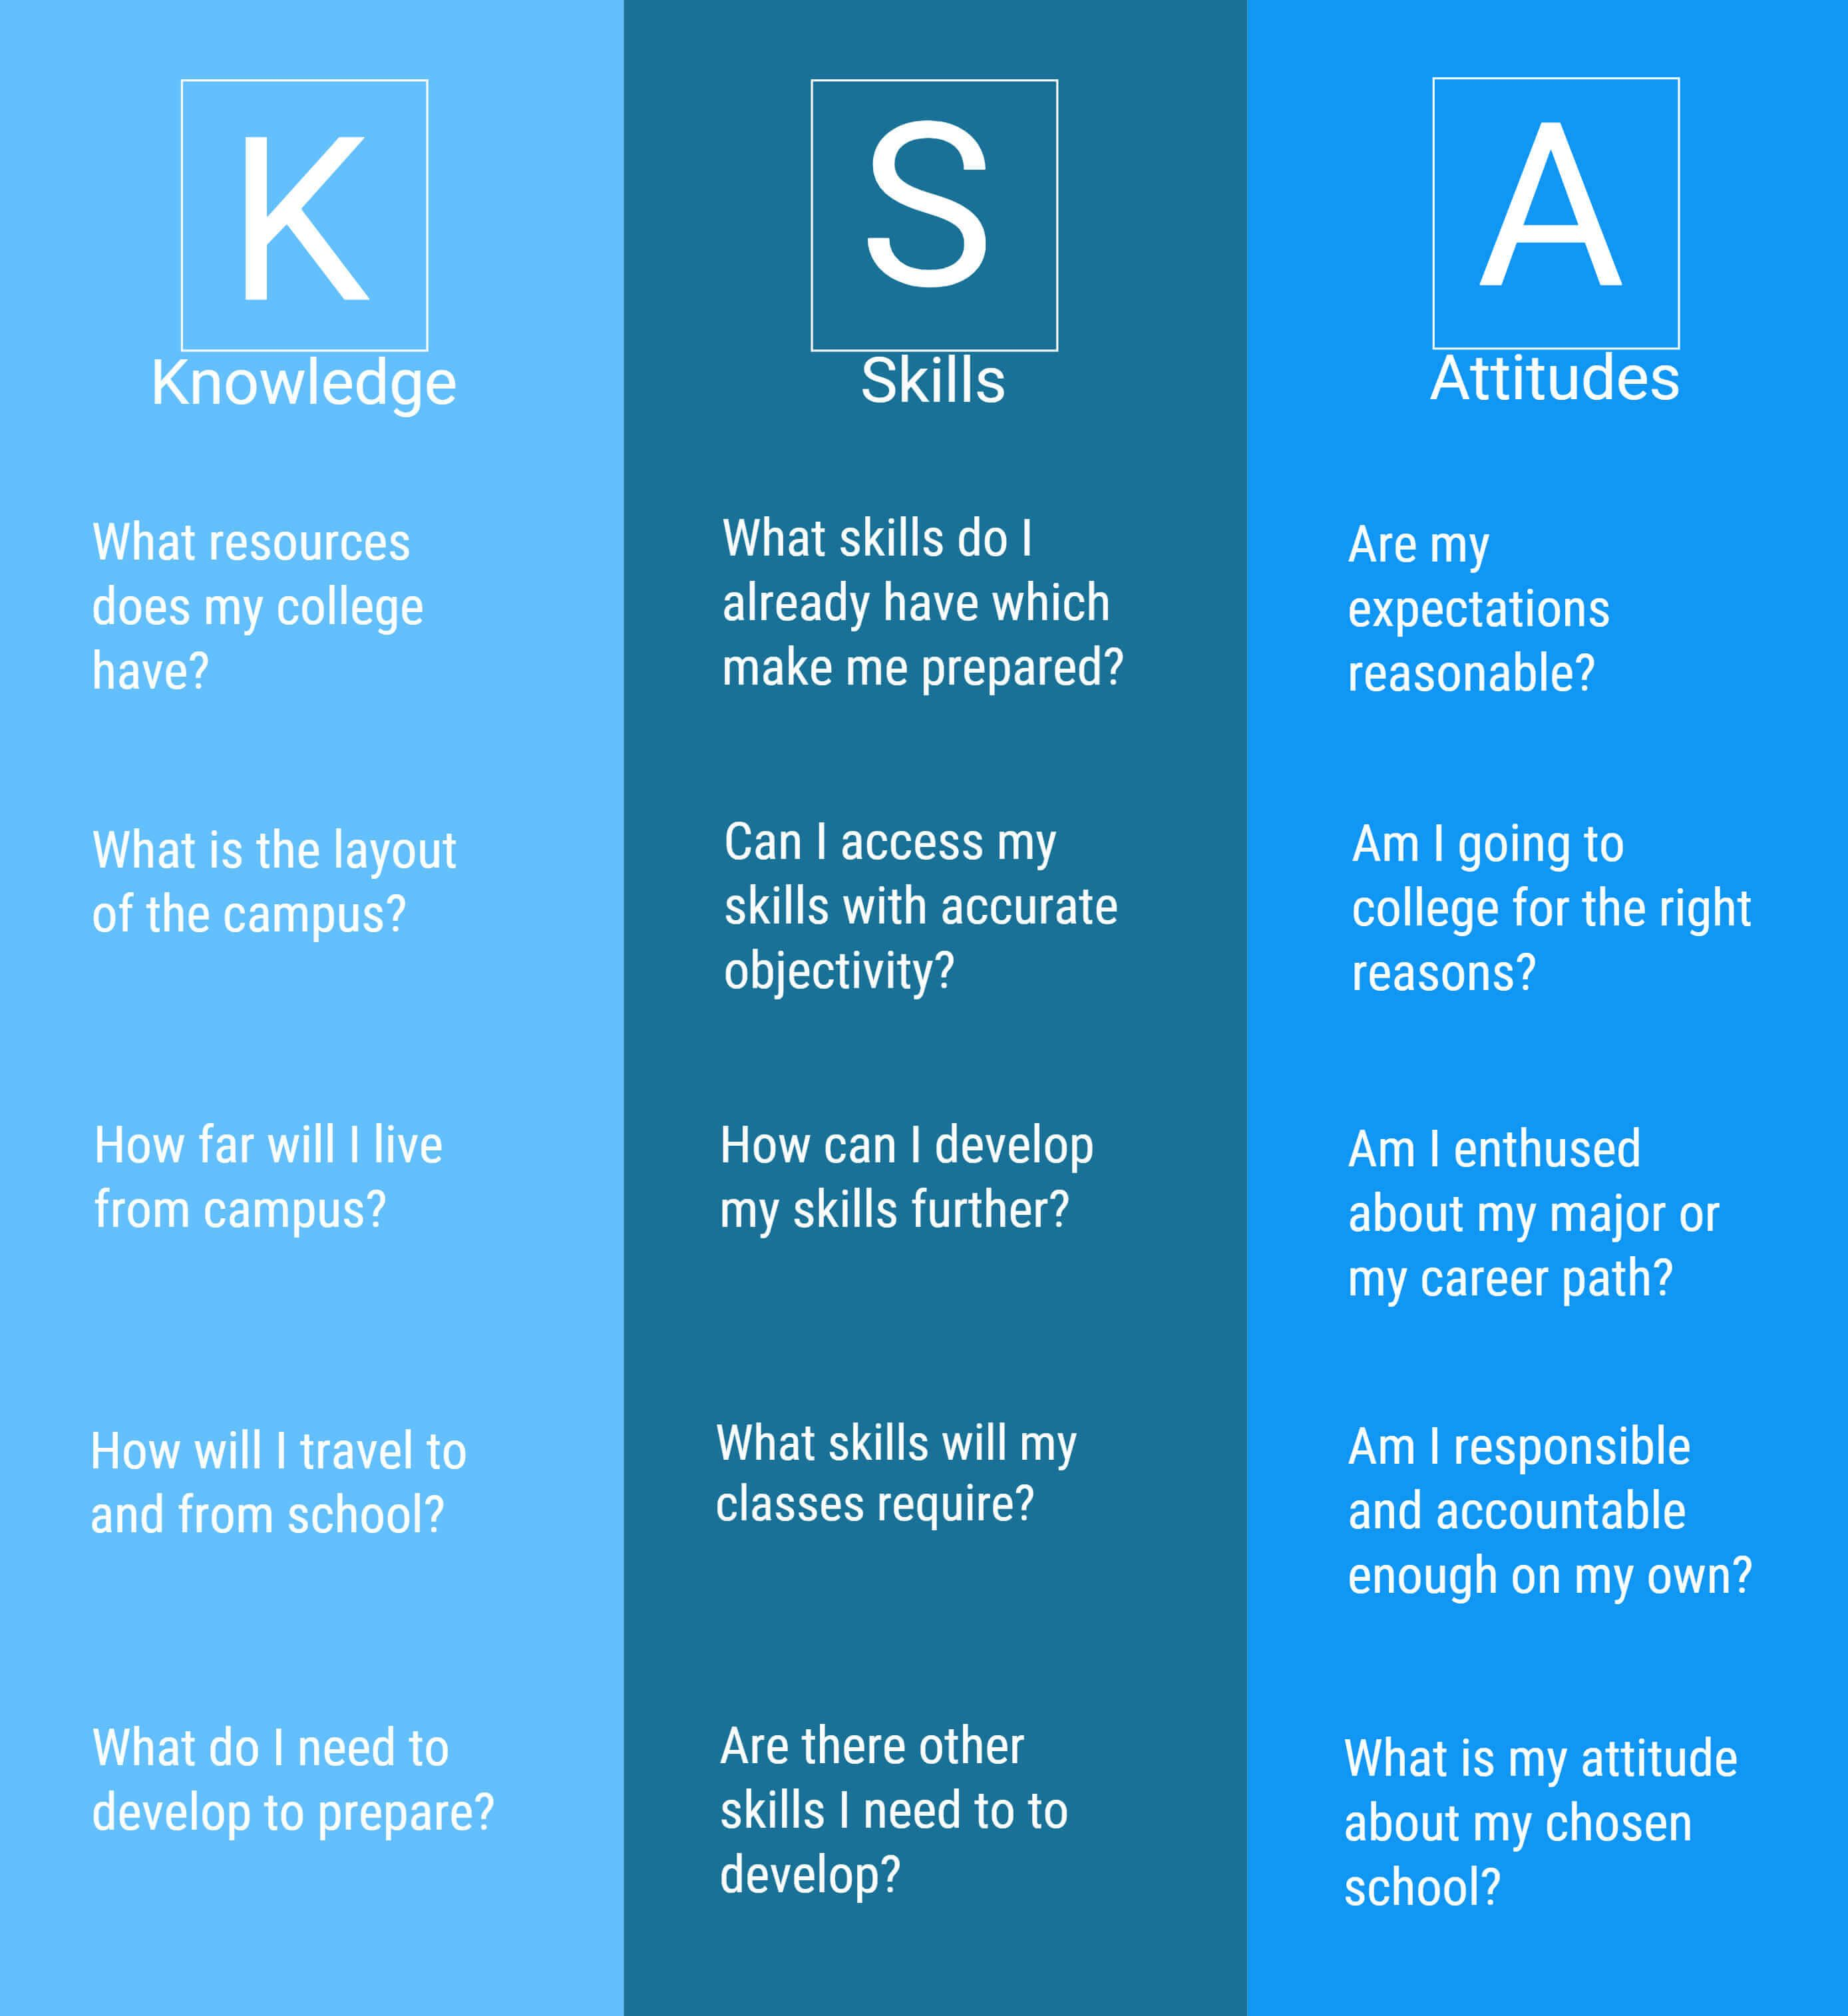 Ksa Knowledge Skills And Attitudes High School High School Students College